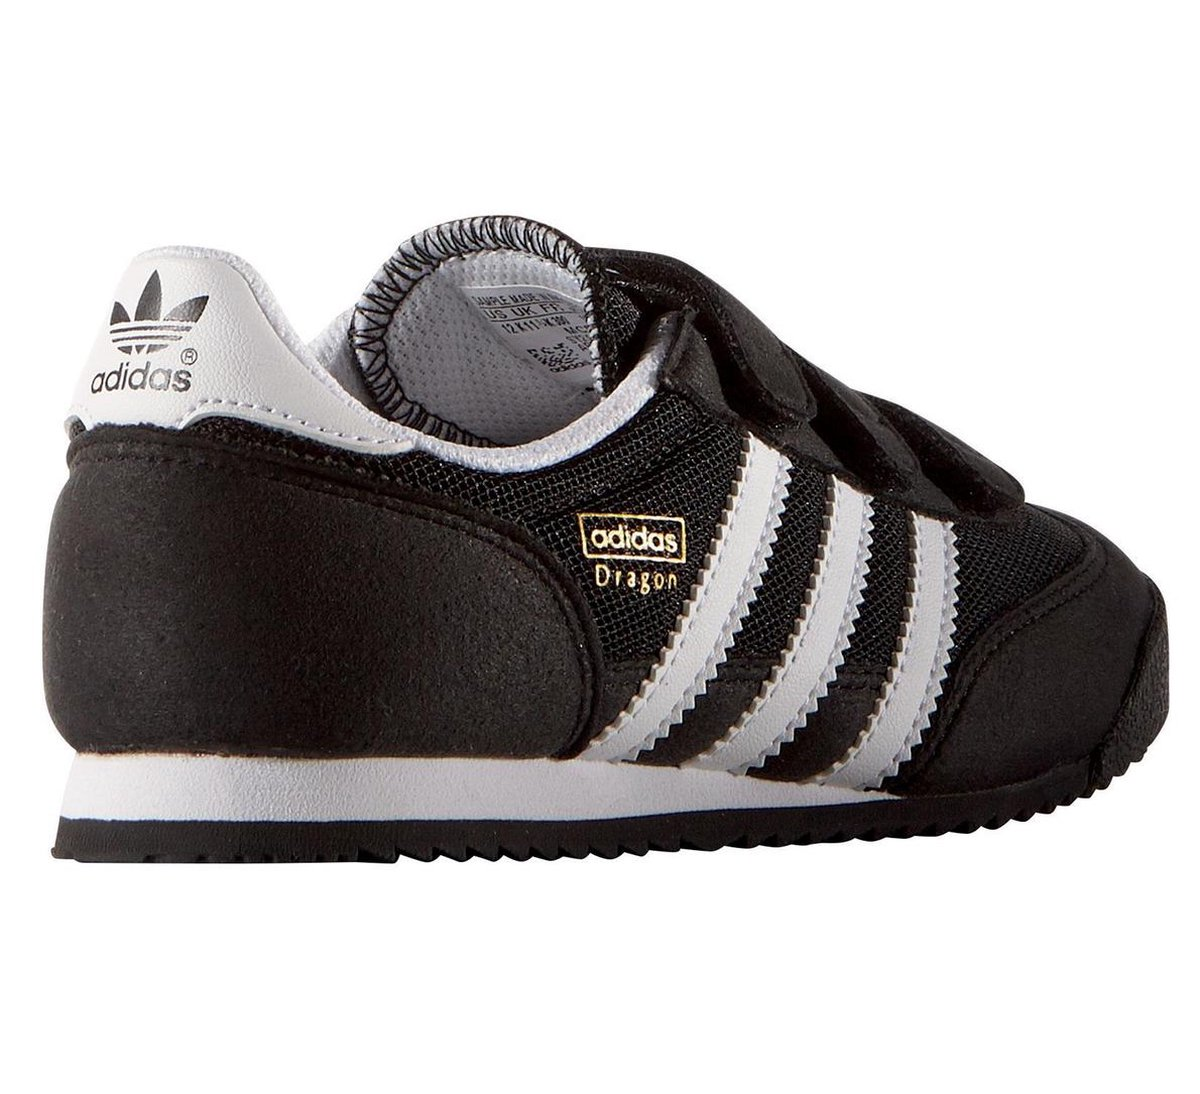 adidas dragon zwart